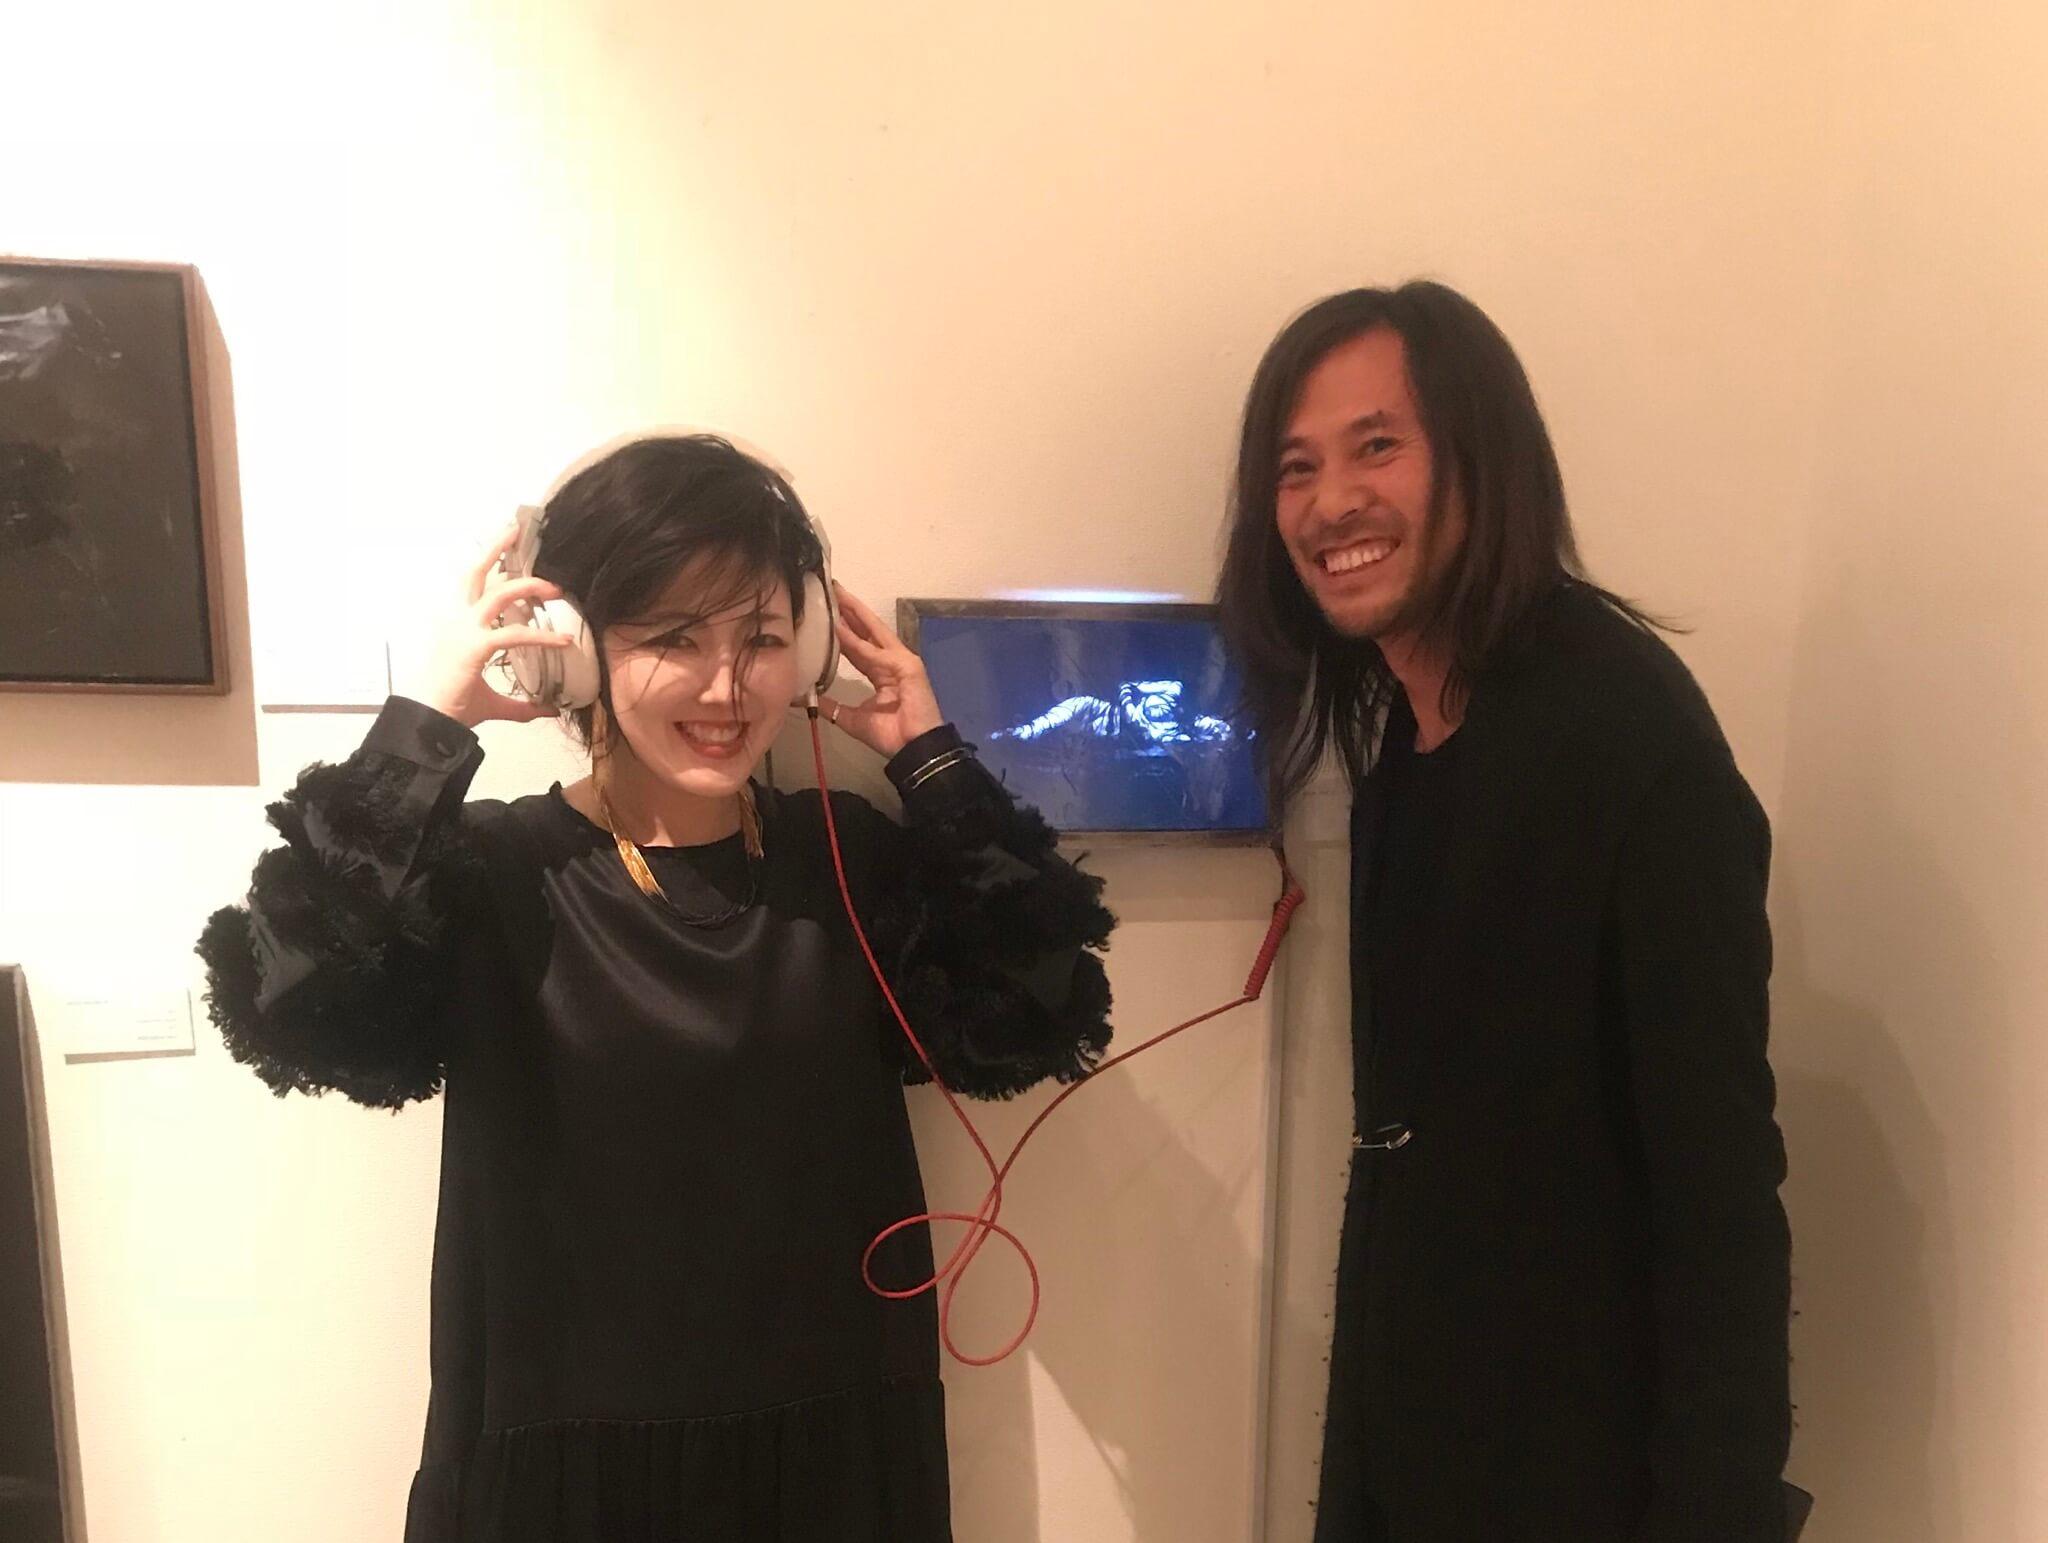 2019/2/15 artPotluck パフォーマンス再演